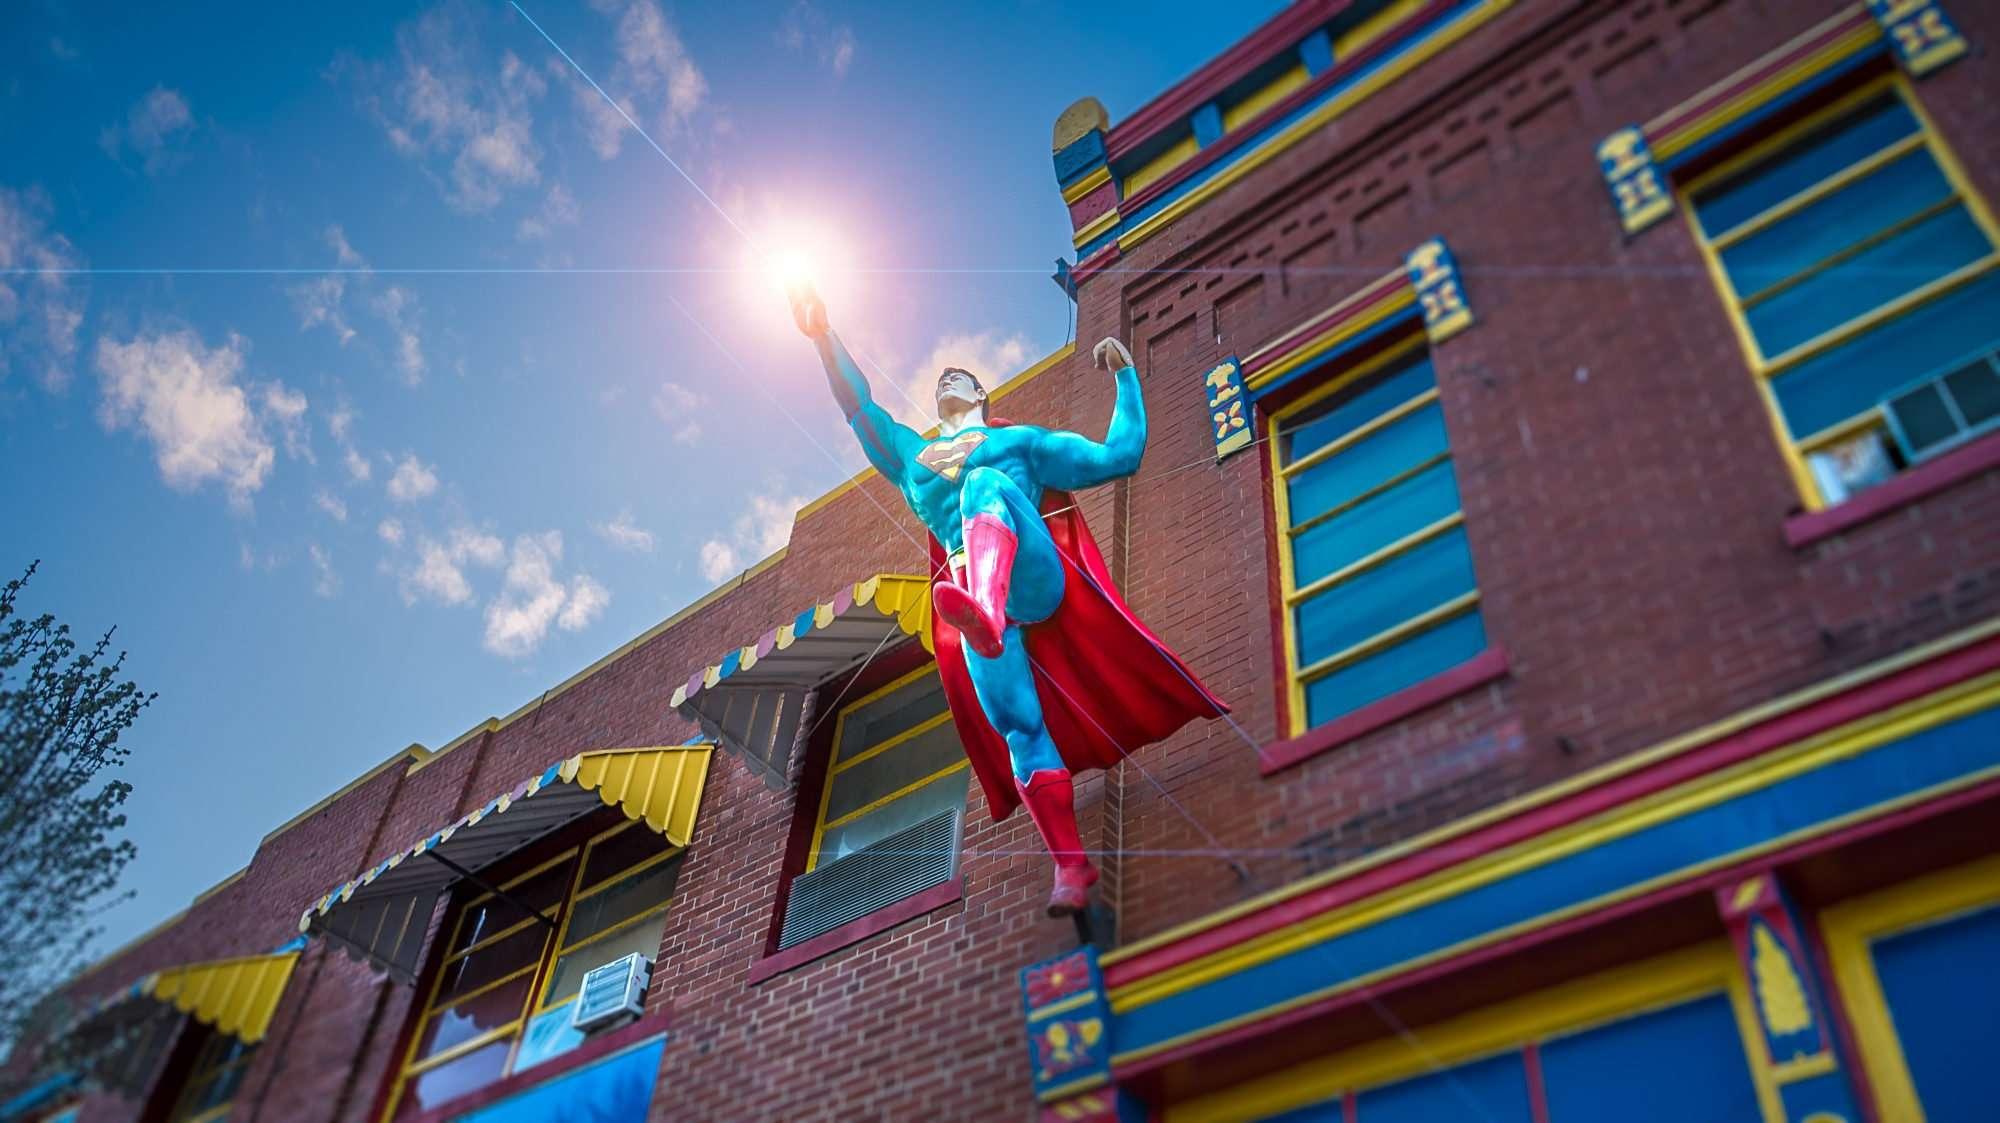 Feb 27, 2017 - Superman taking flight on building in Metropolis, IL/photonews247.com